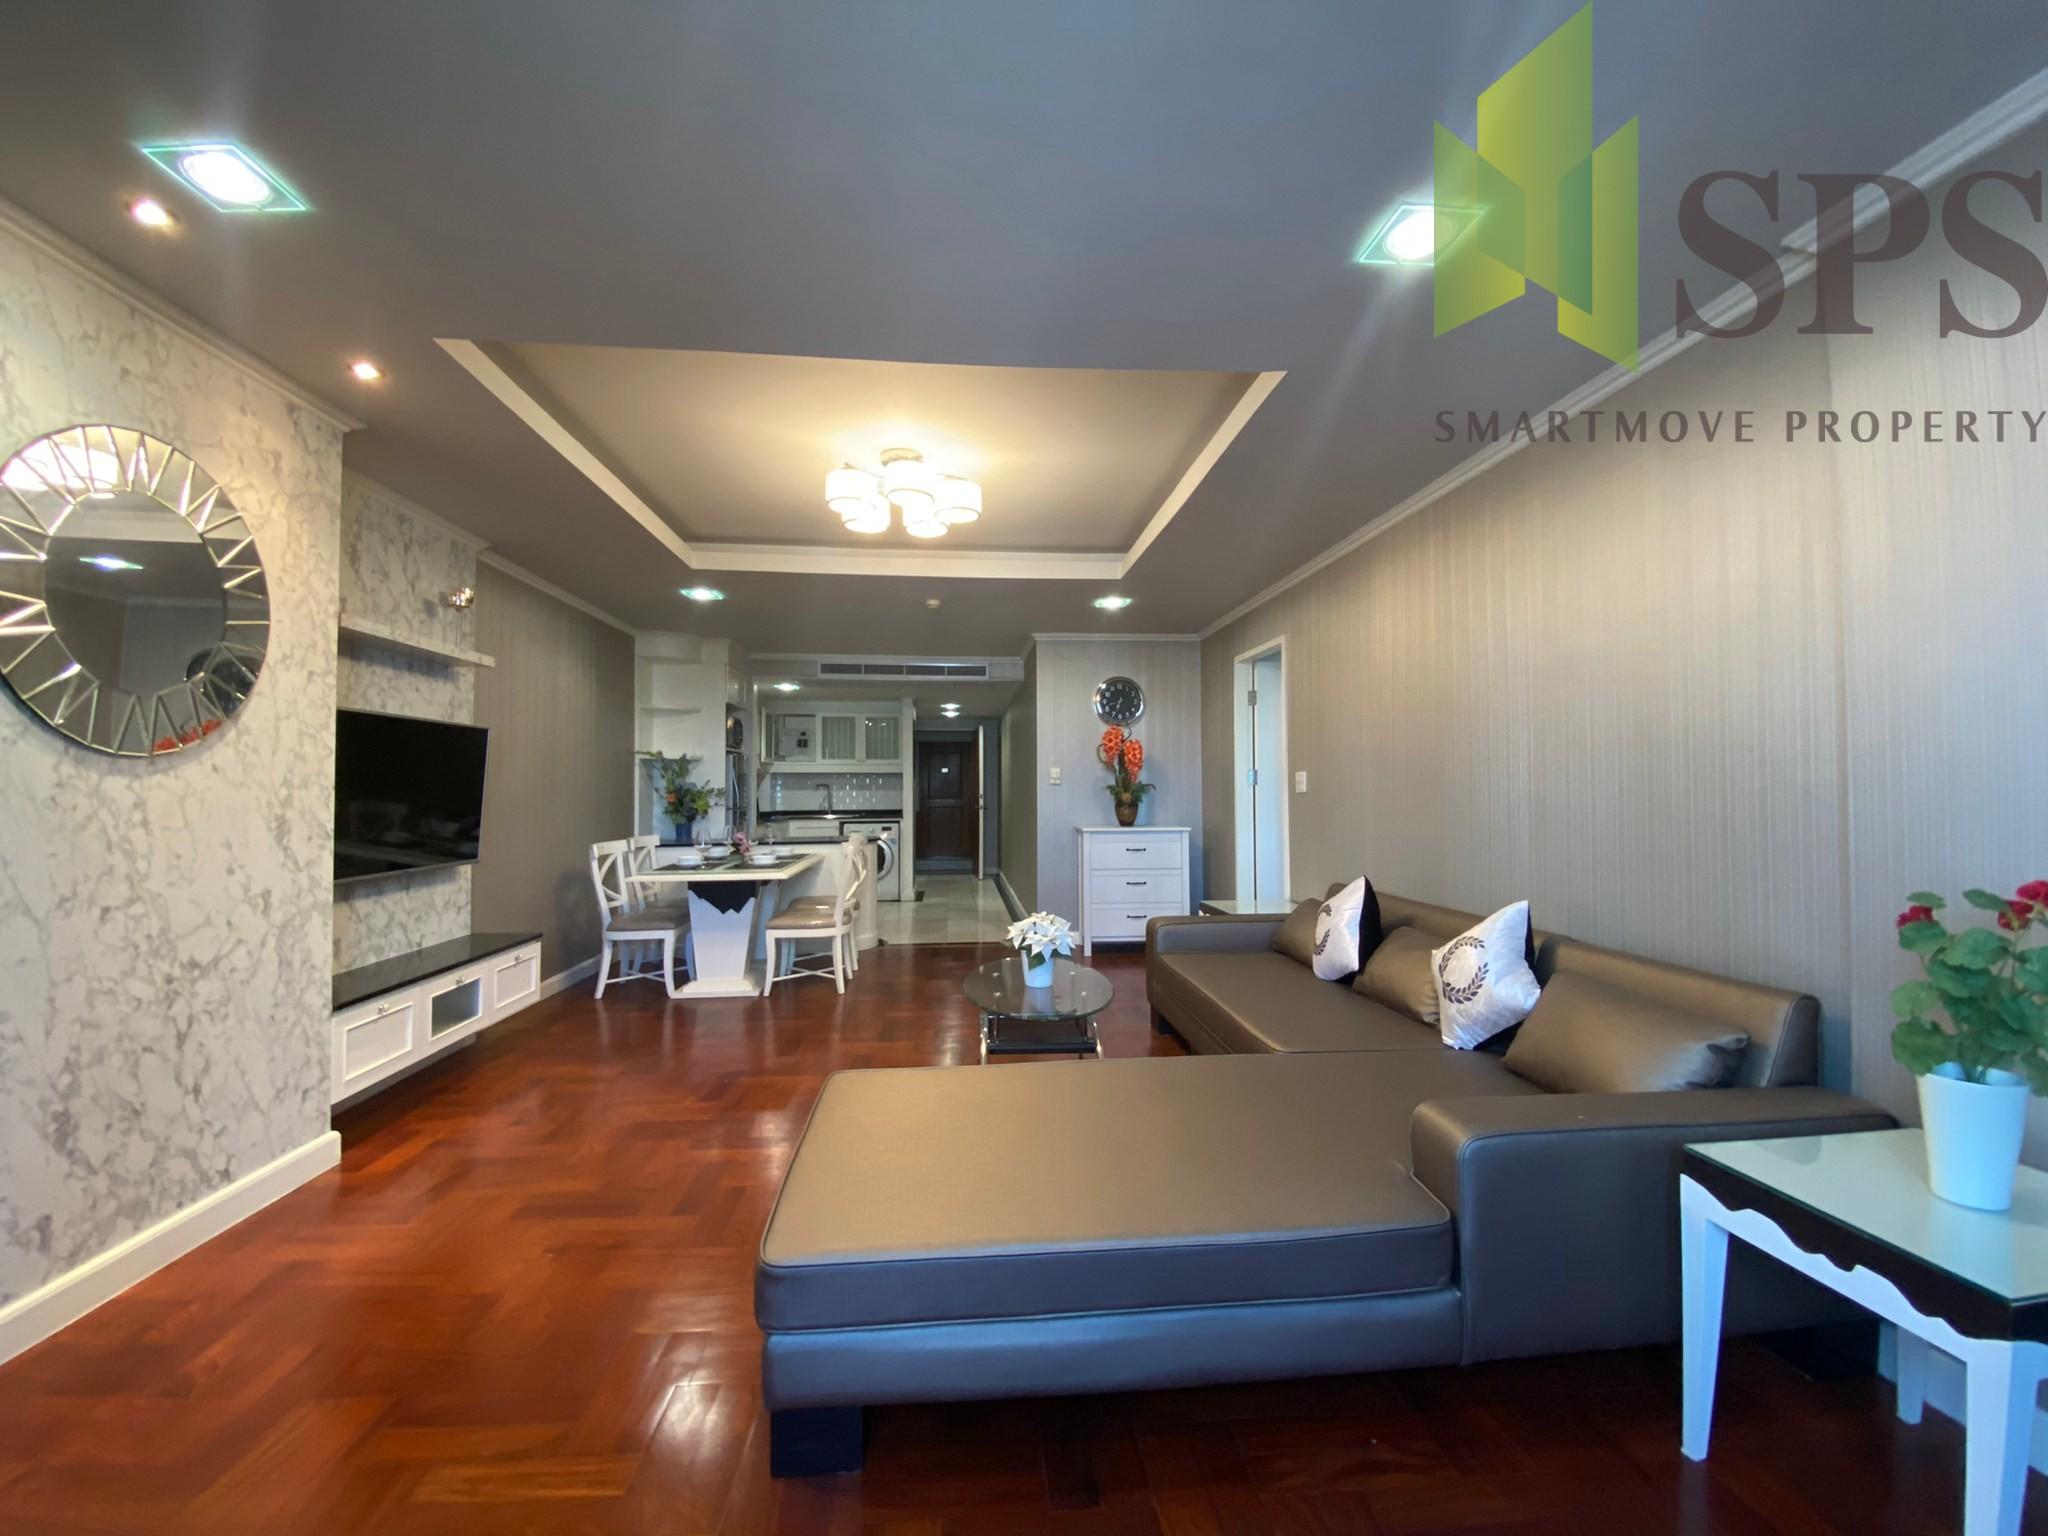 For Rent and Sale Lake Avenue Condominium/ เช่า และ ขาย คอนโด เลค อเวนิว สุขุมวิท 16(Property ID: SPS-PP323)